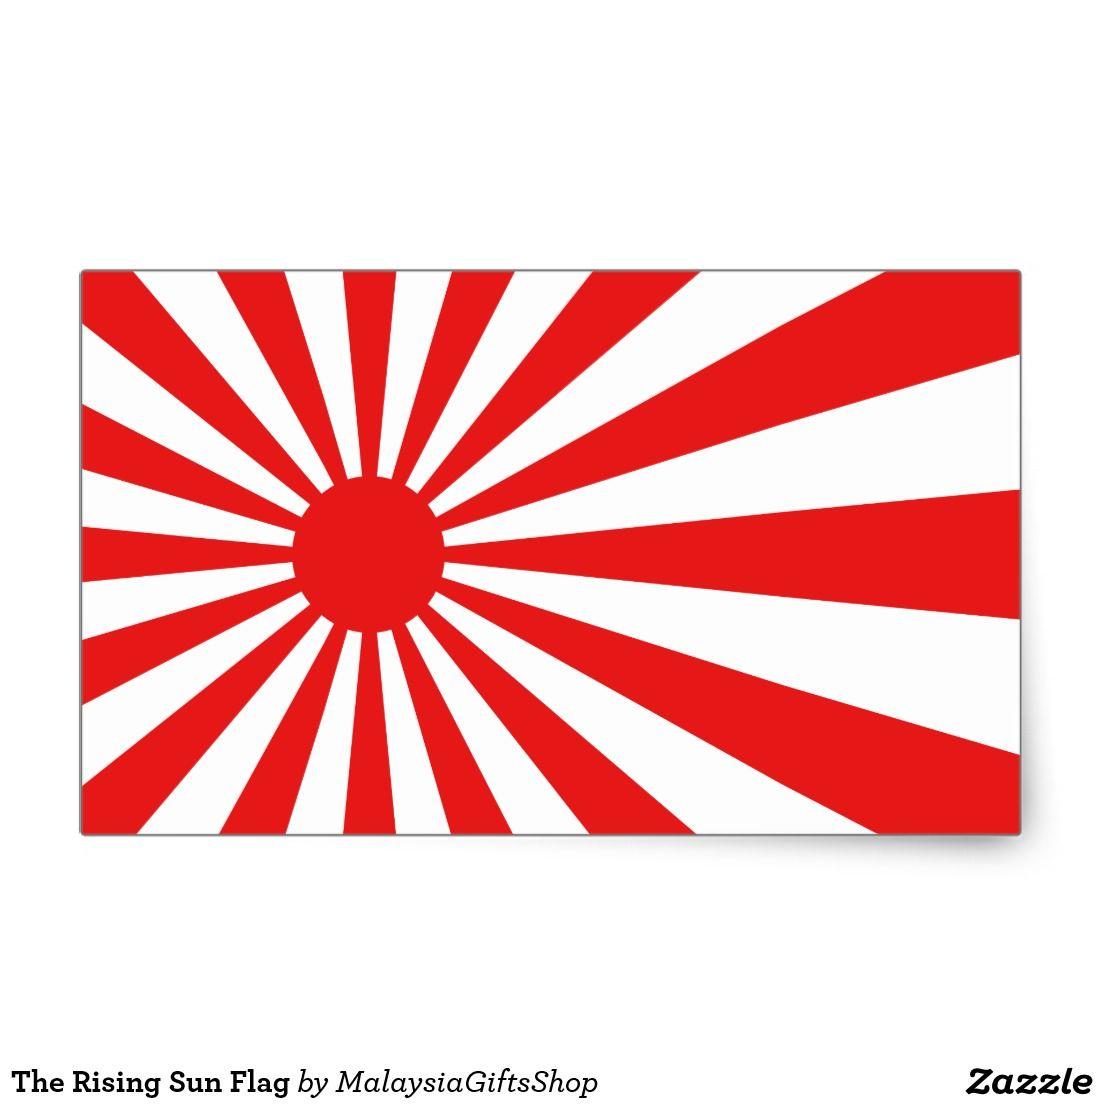 Stickers emblems flags japanese flag helmet visor sunstrip sticker race rally car bike japan navy honda